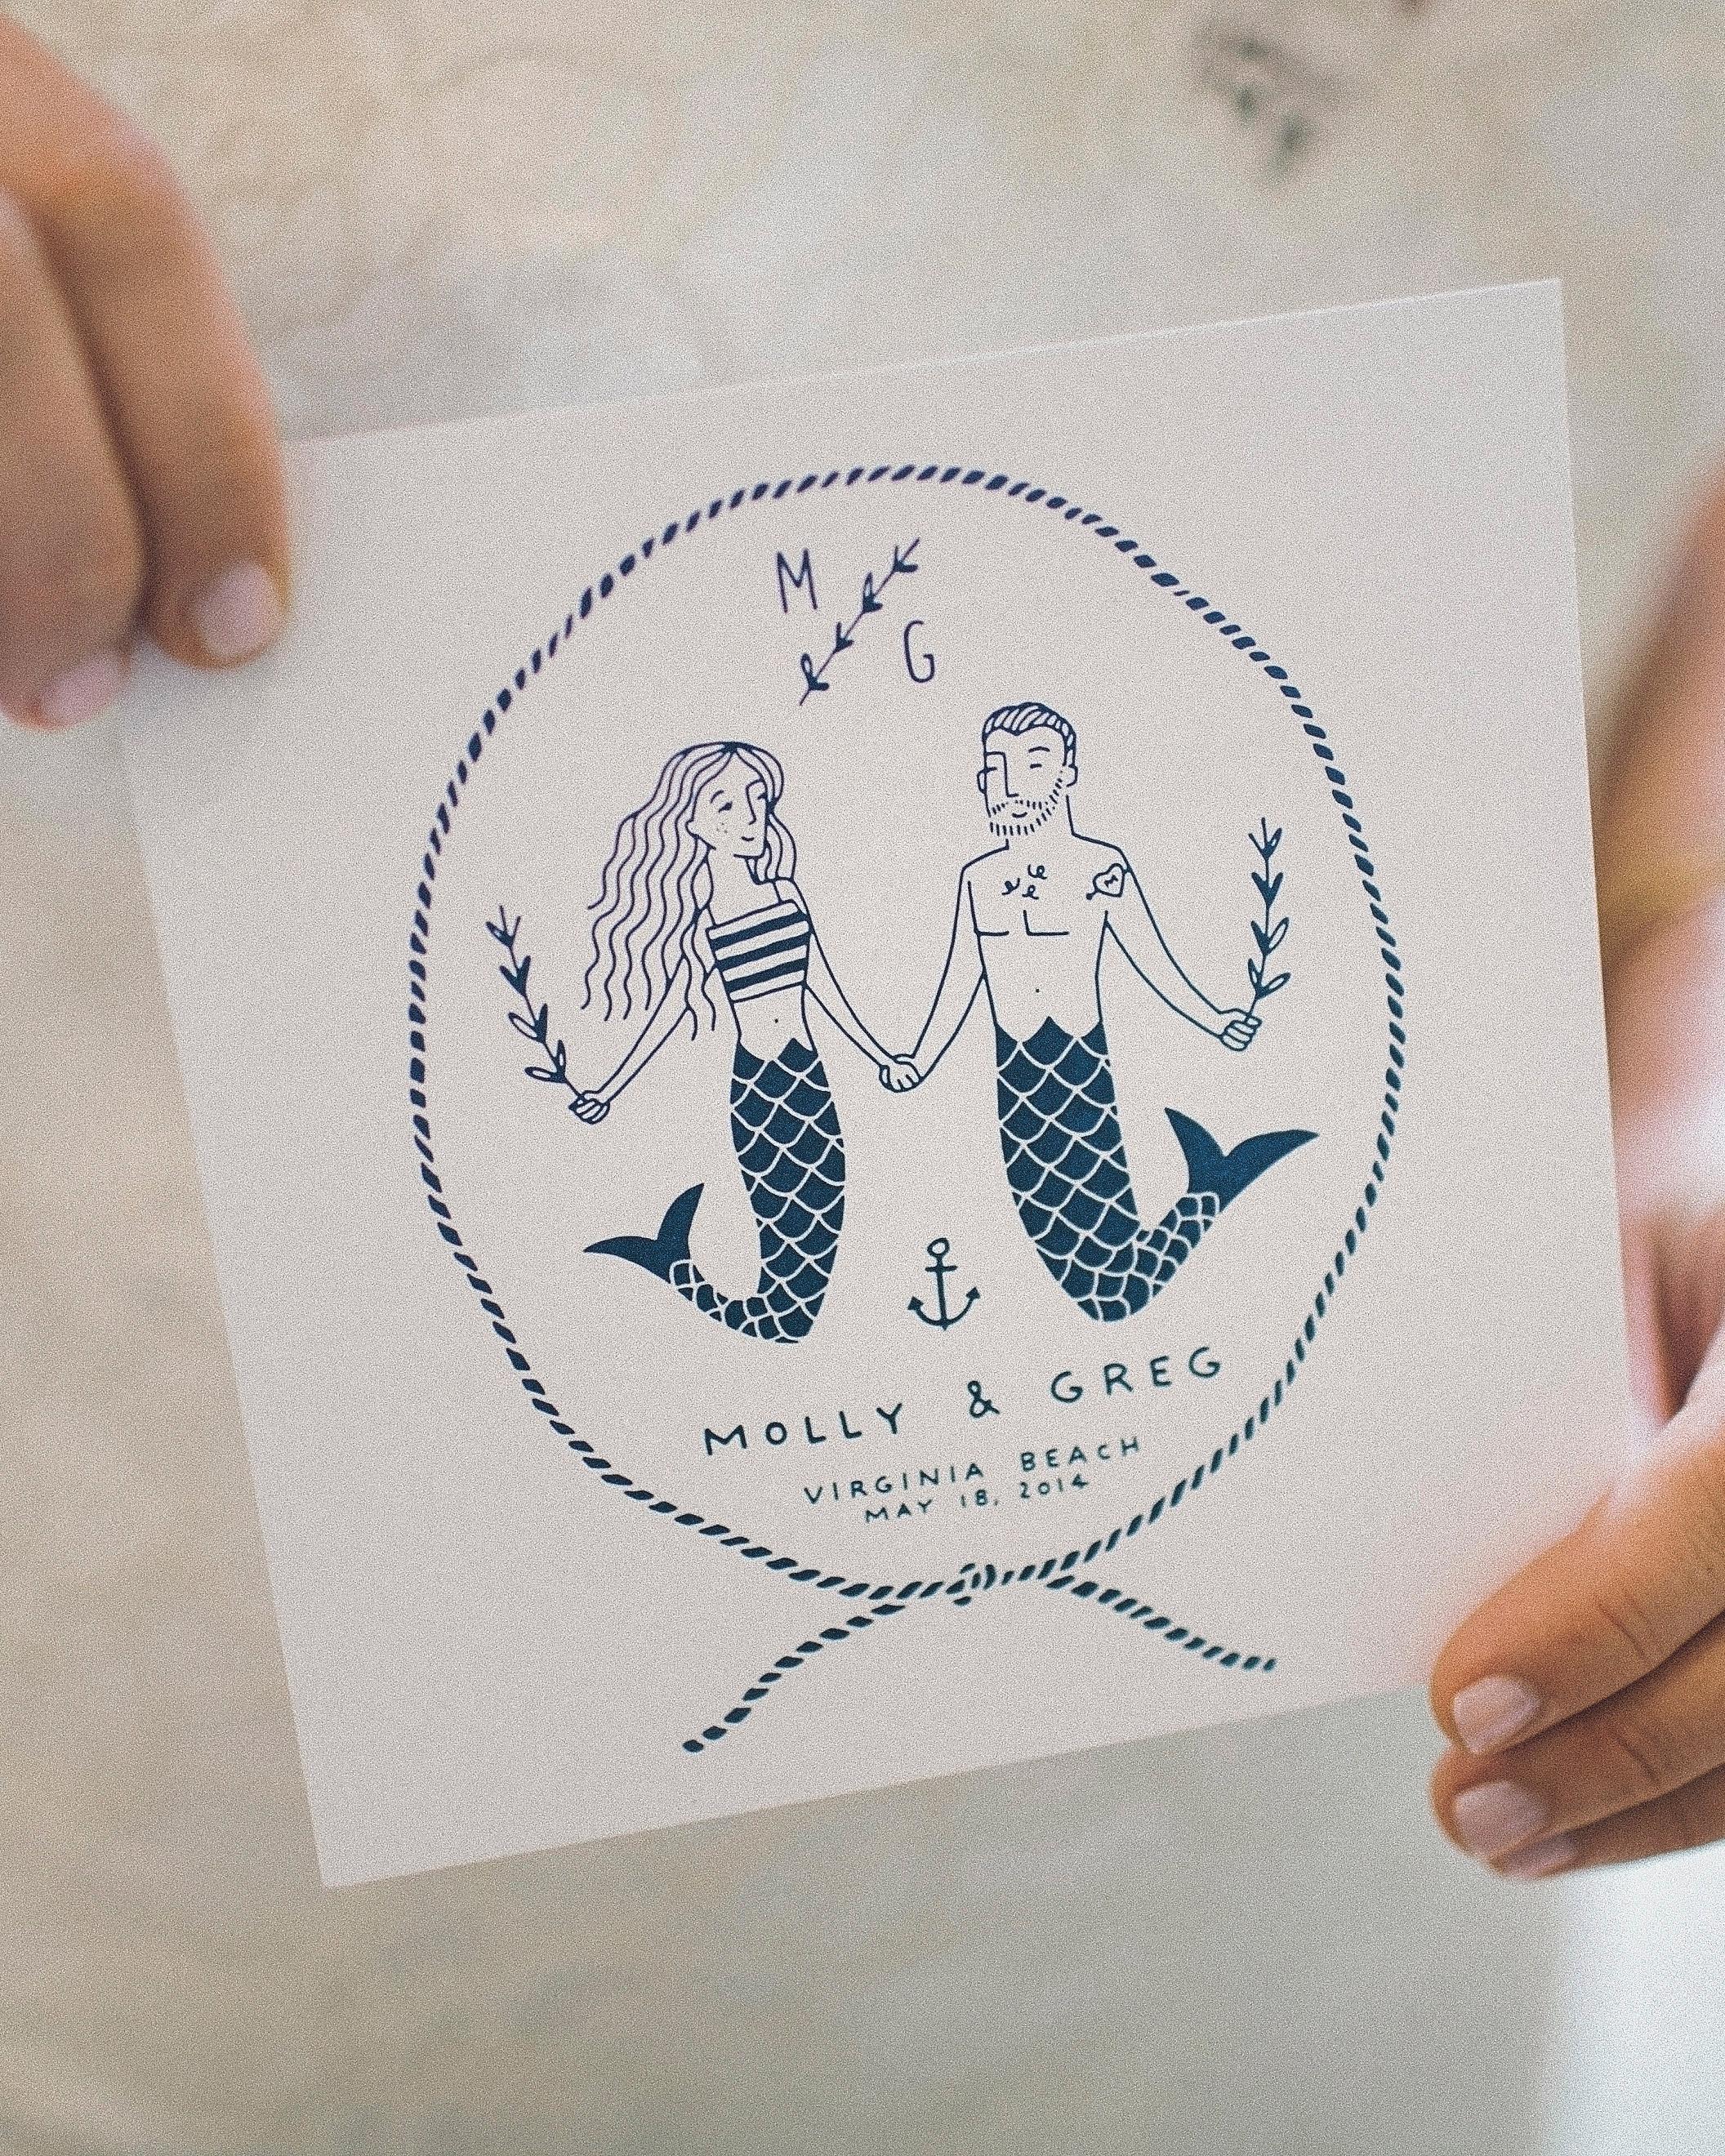 molly-greg-wedding-mermaids-00018-s111481-0814.jpg